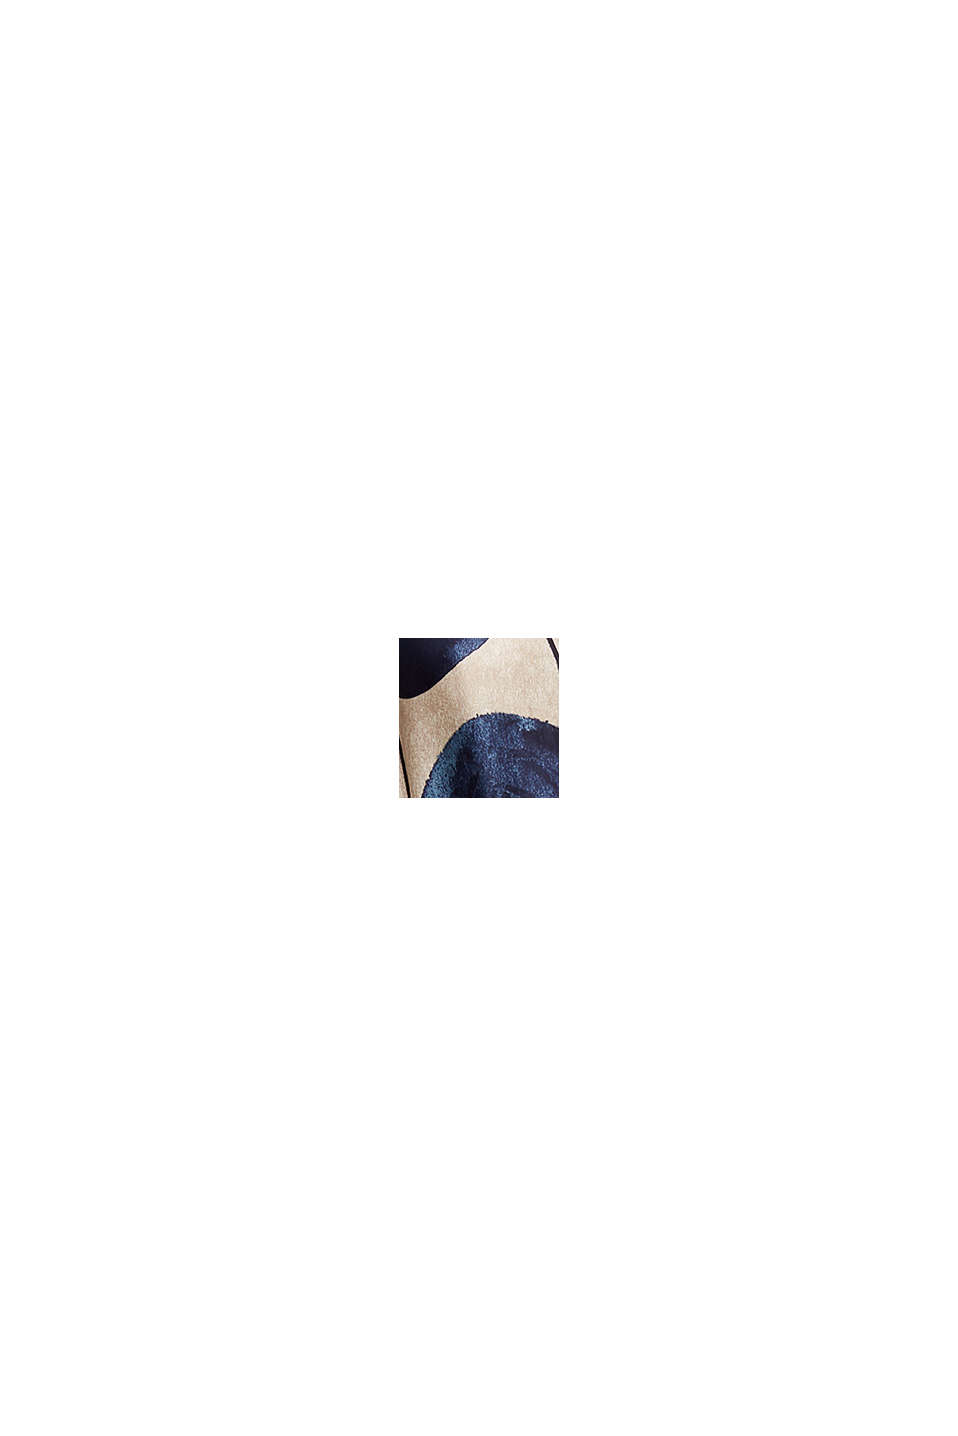 Robe longueur midi en satin à motif, BRIGHT BLUE, swatch